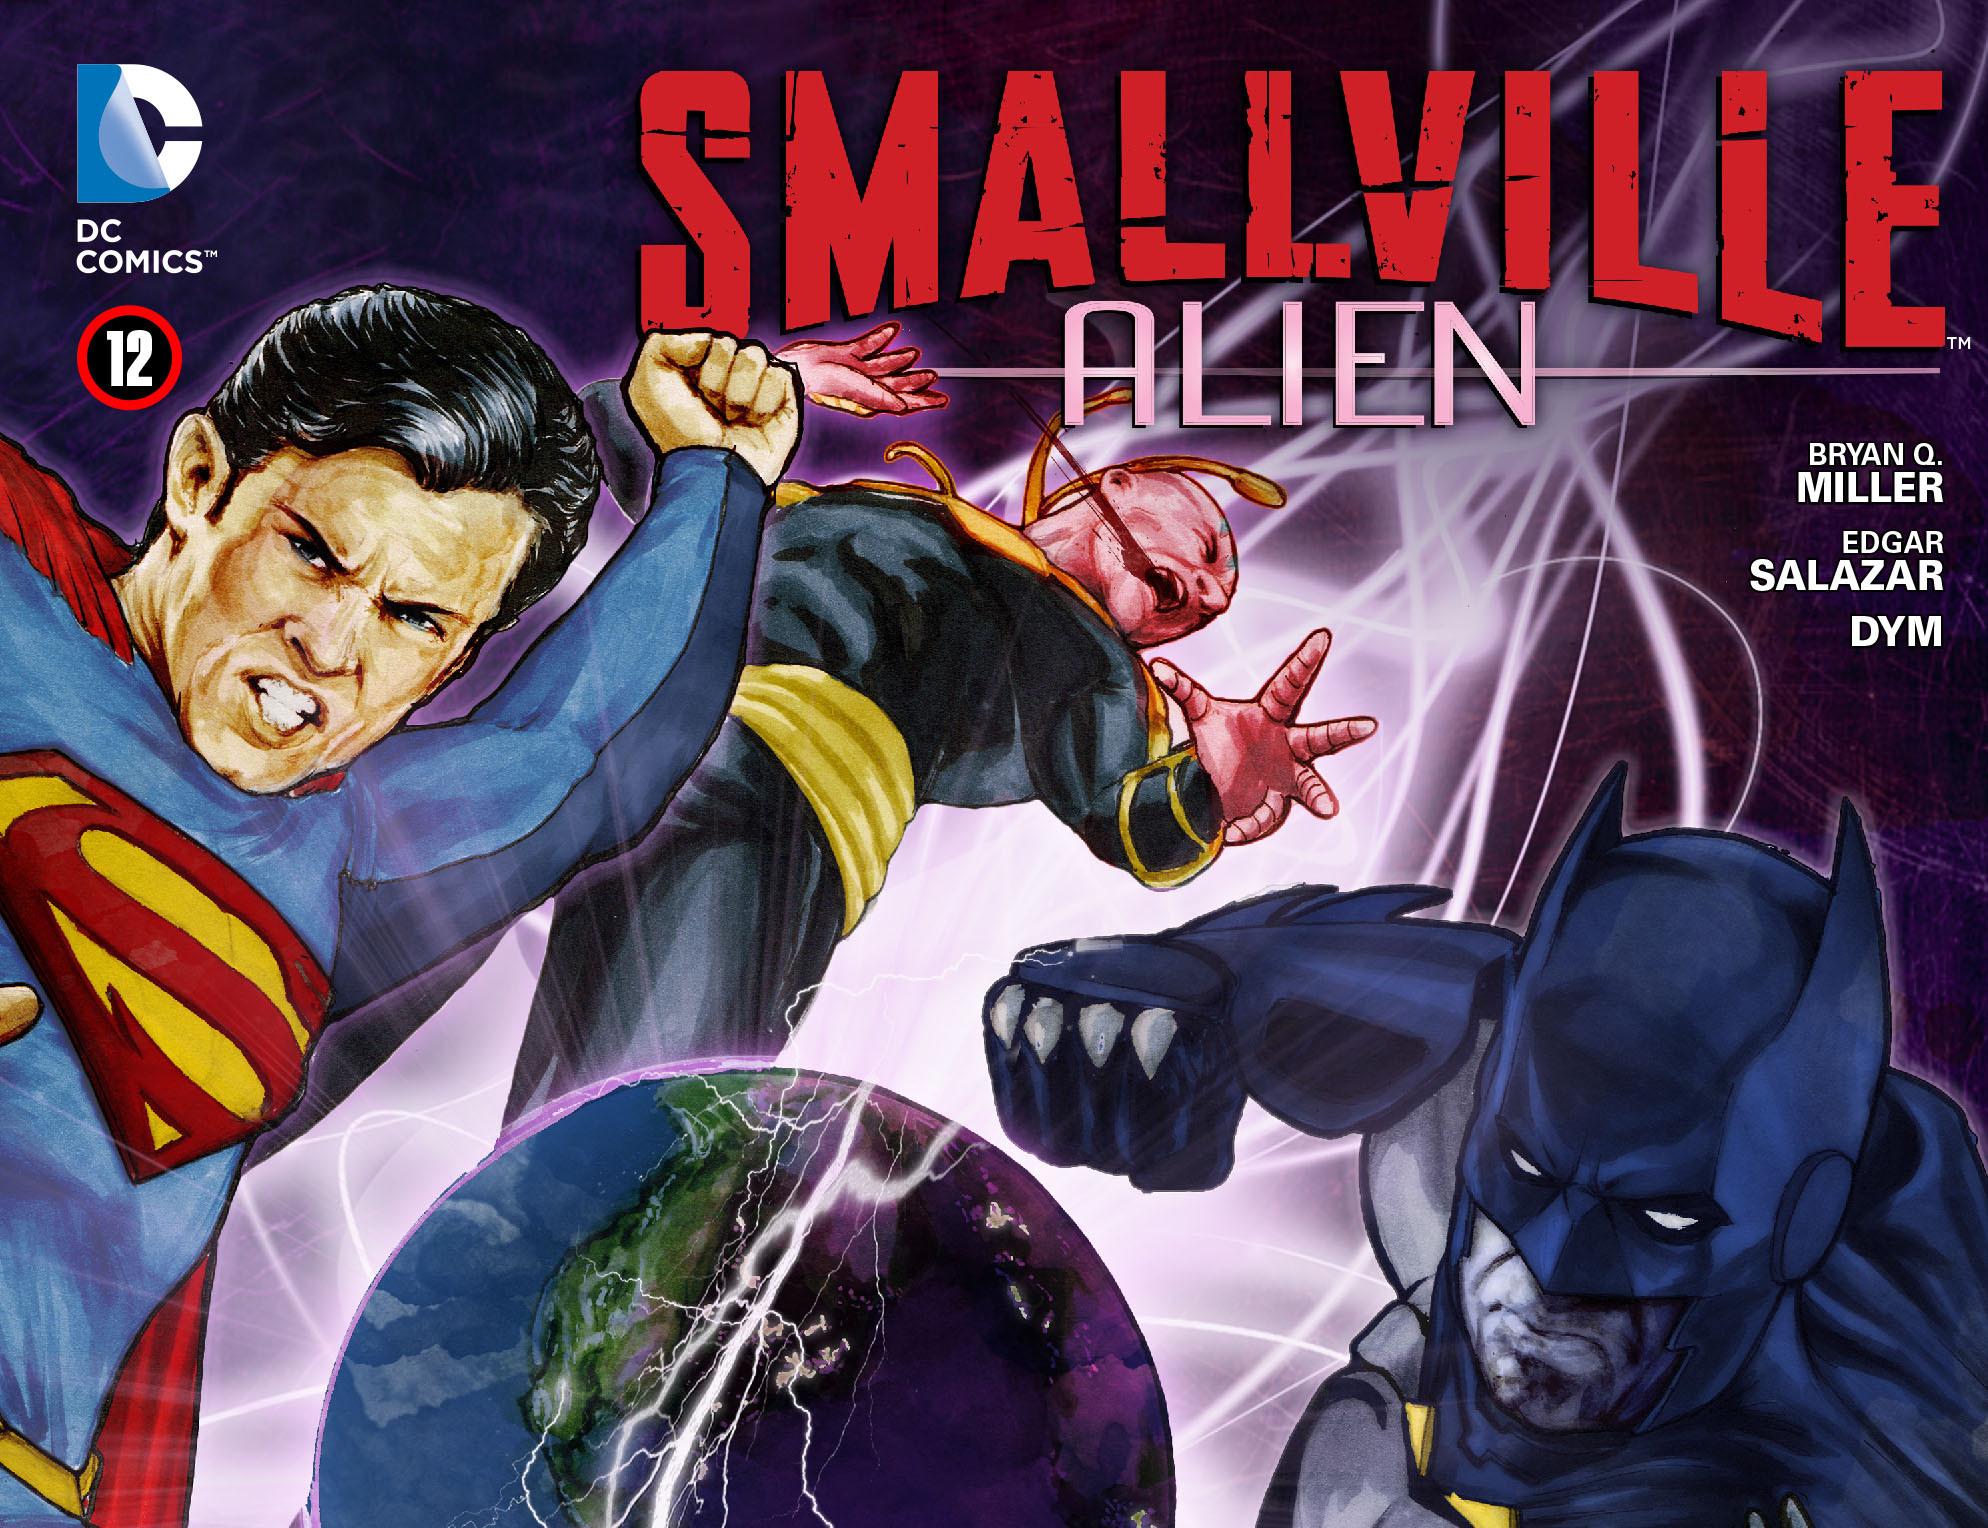 Read online Smallville: Alien comic -  Issue #12 - 1